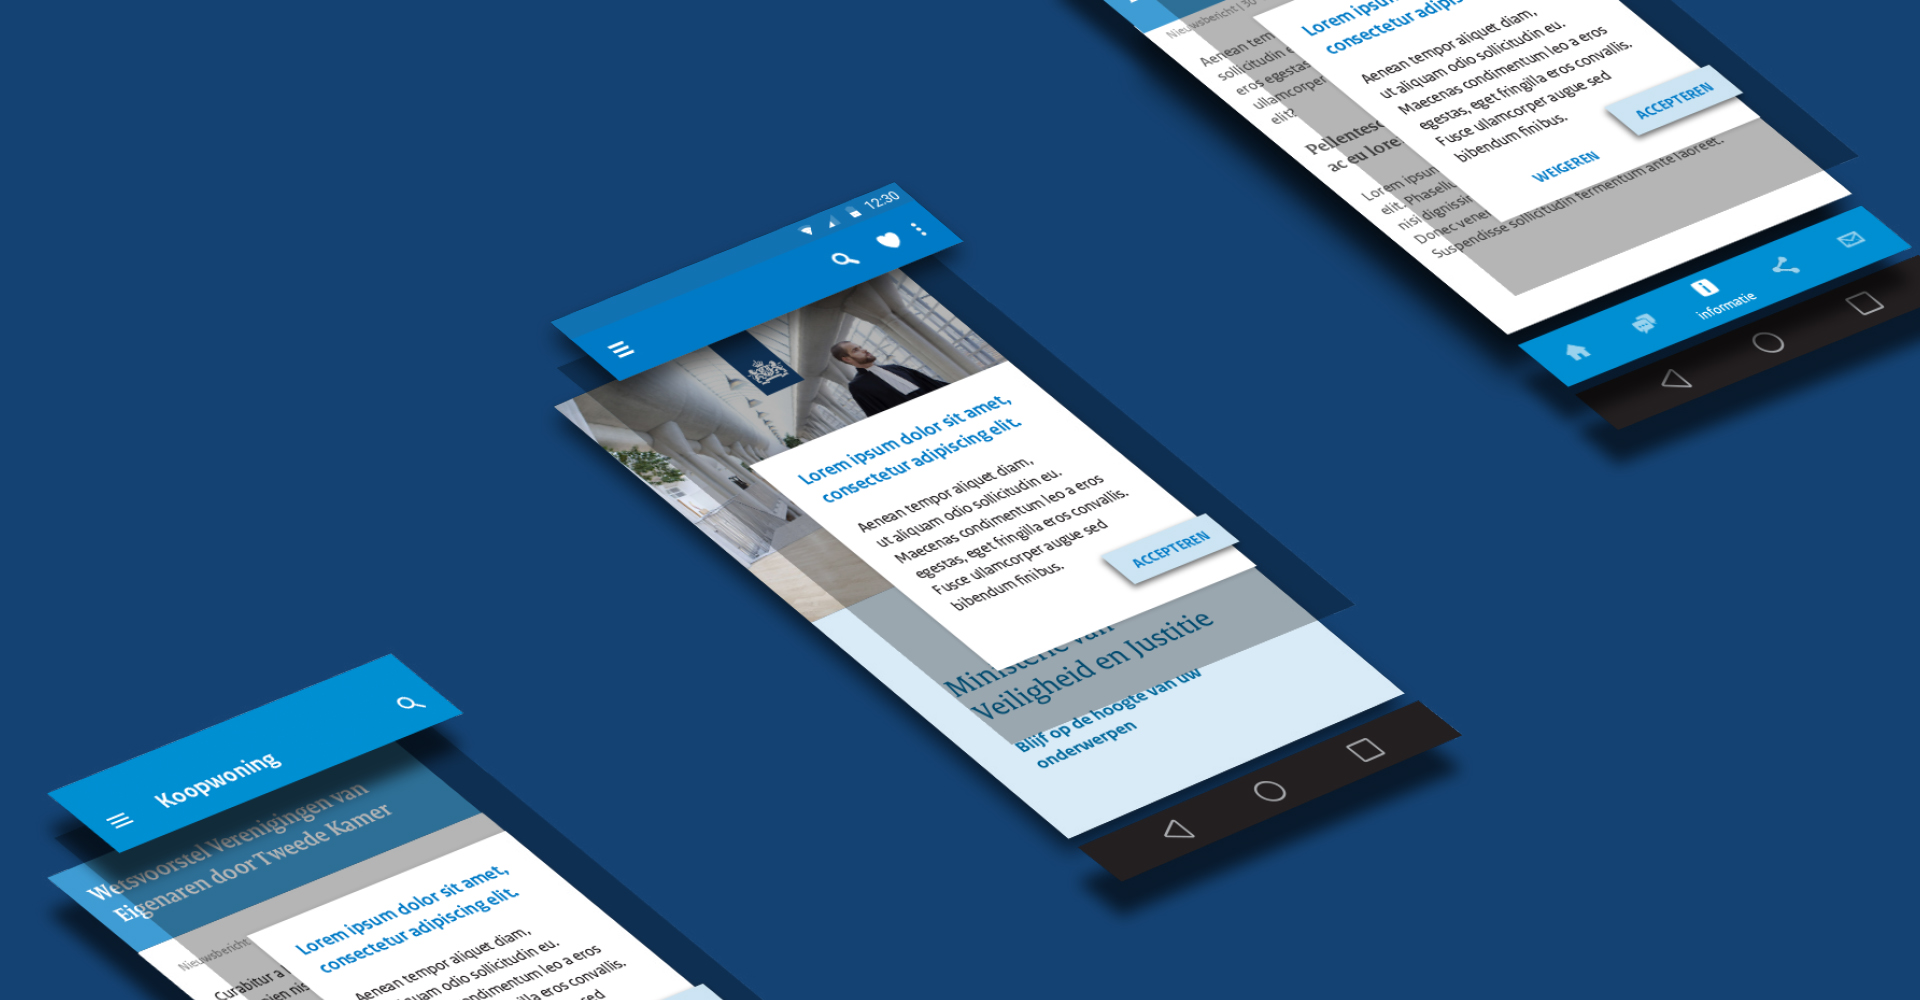 Rijksoverheid. Designtaal voor Digitaal mockup mobiel – Dutchgiraffe | Digital Creatives